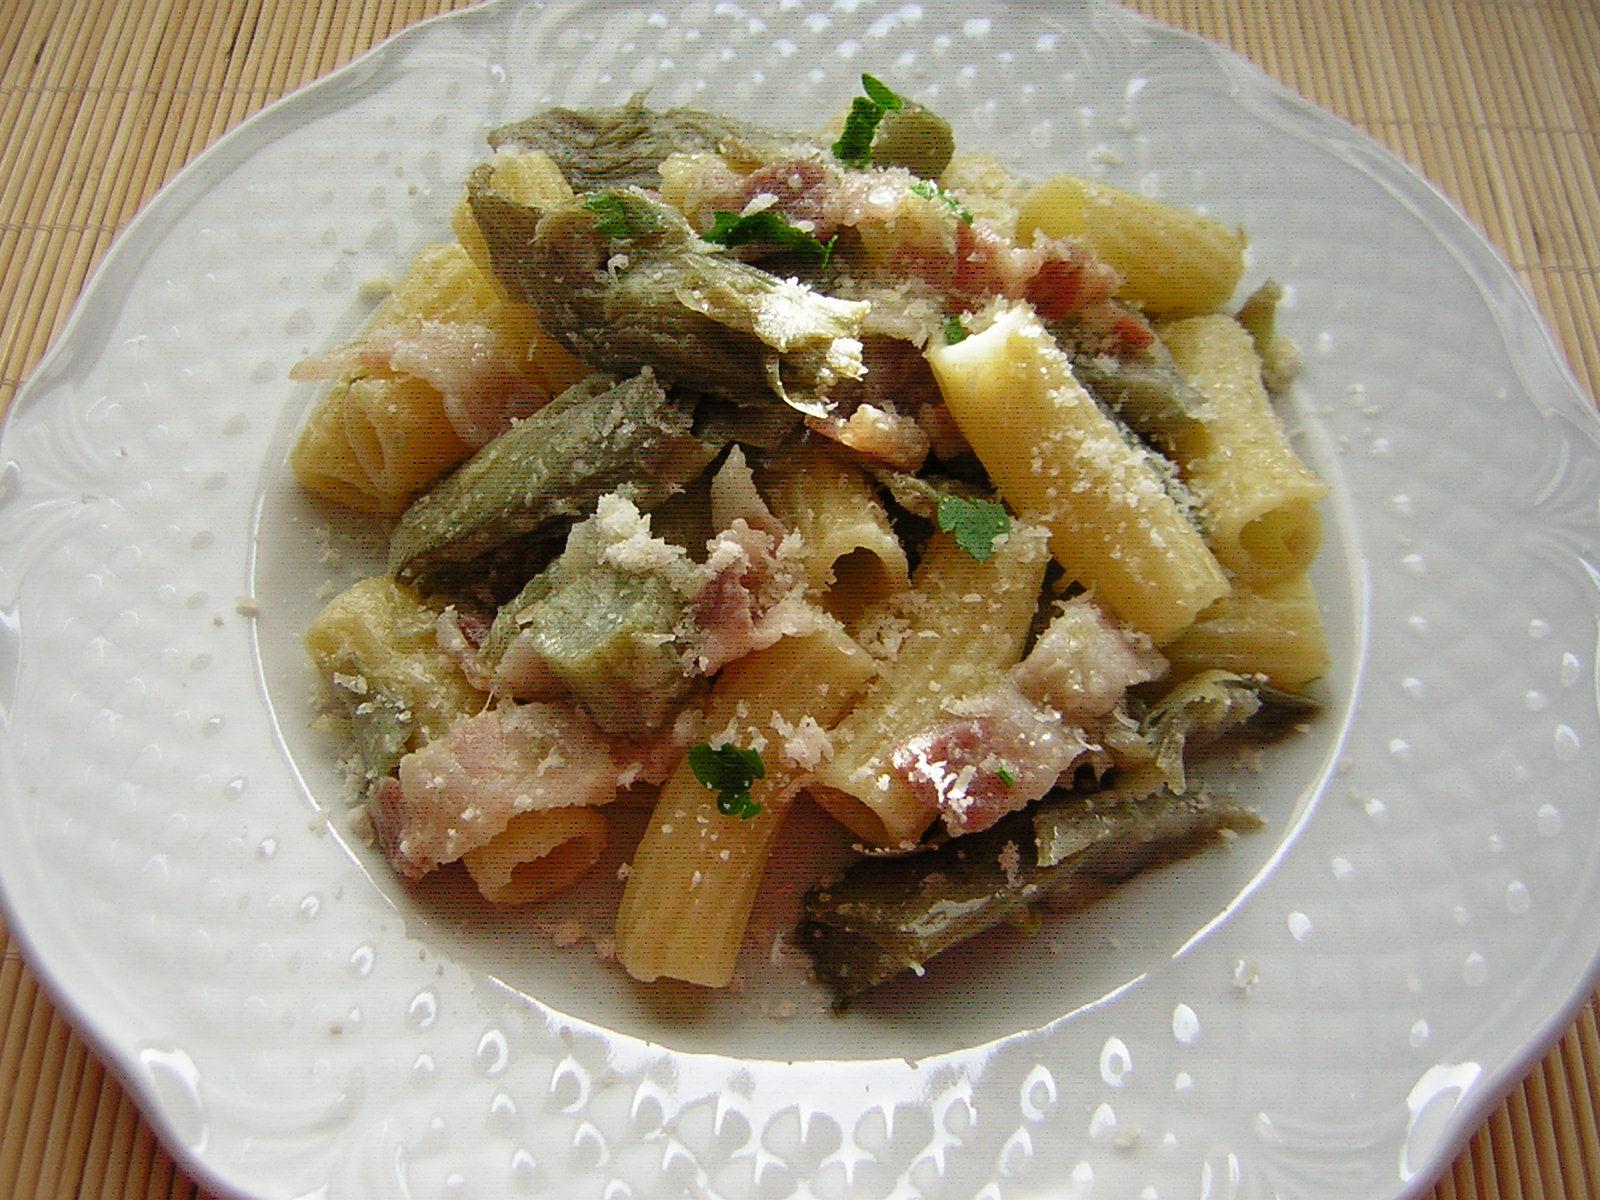 pasta con carciofi e pancetta affumicata